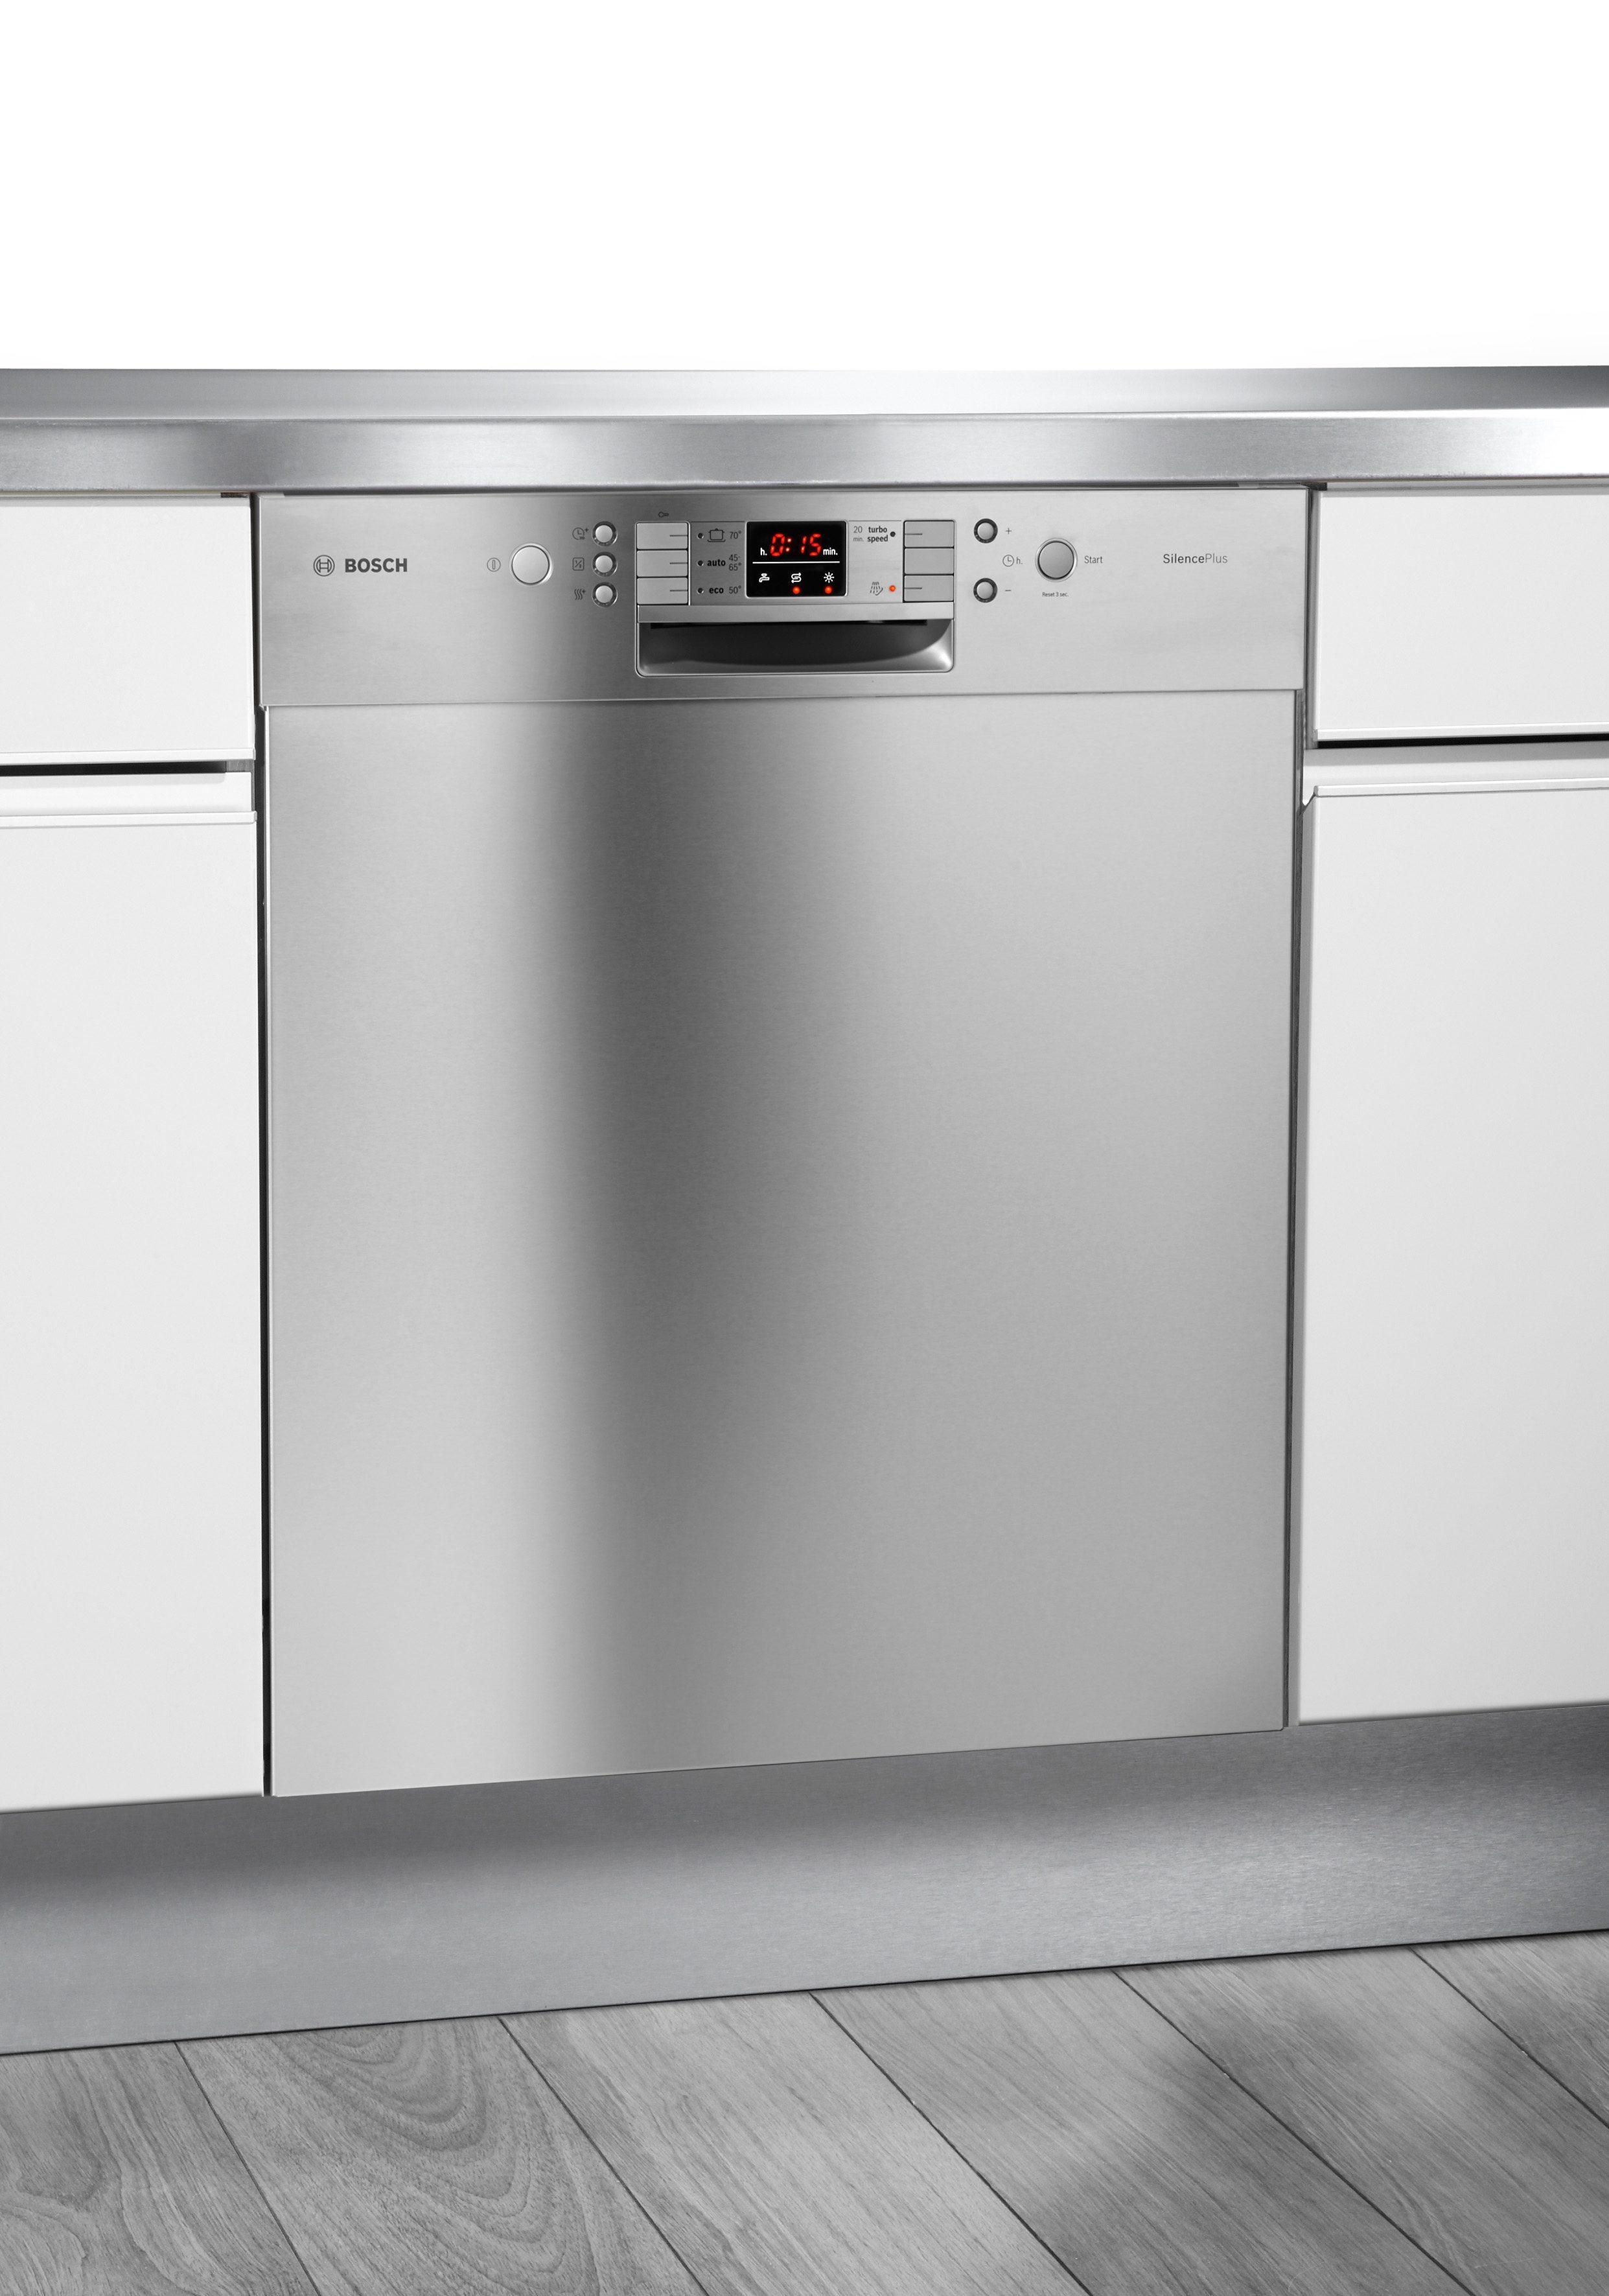 Bosch Unterbau-Geschirrspüler SMU53L65EU, A++, 7,5 Liter, 12 Maßgedecke